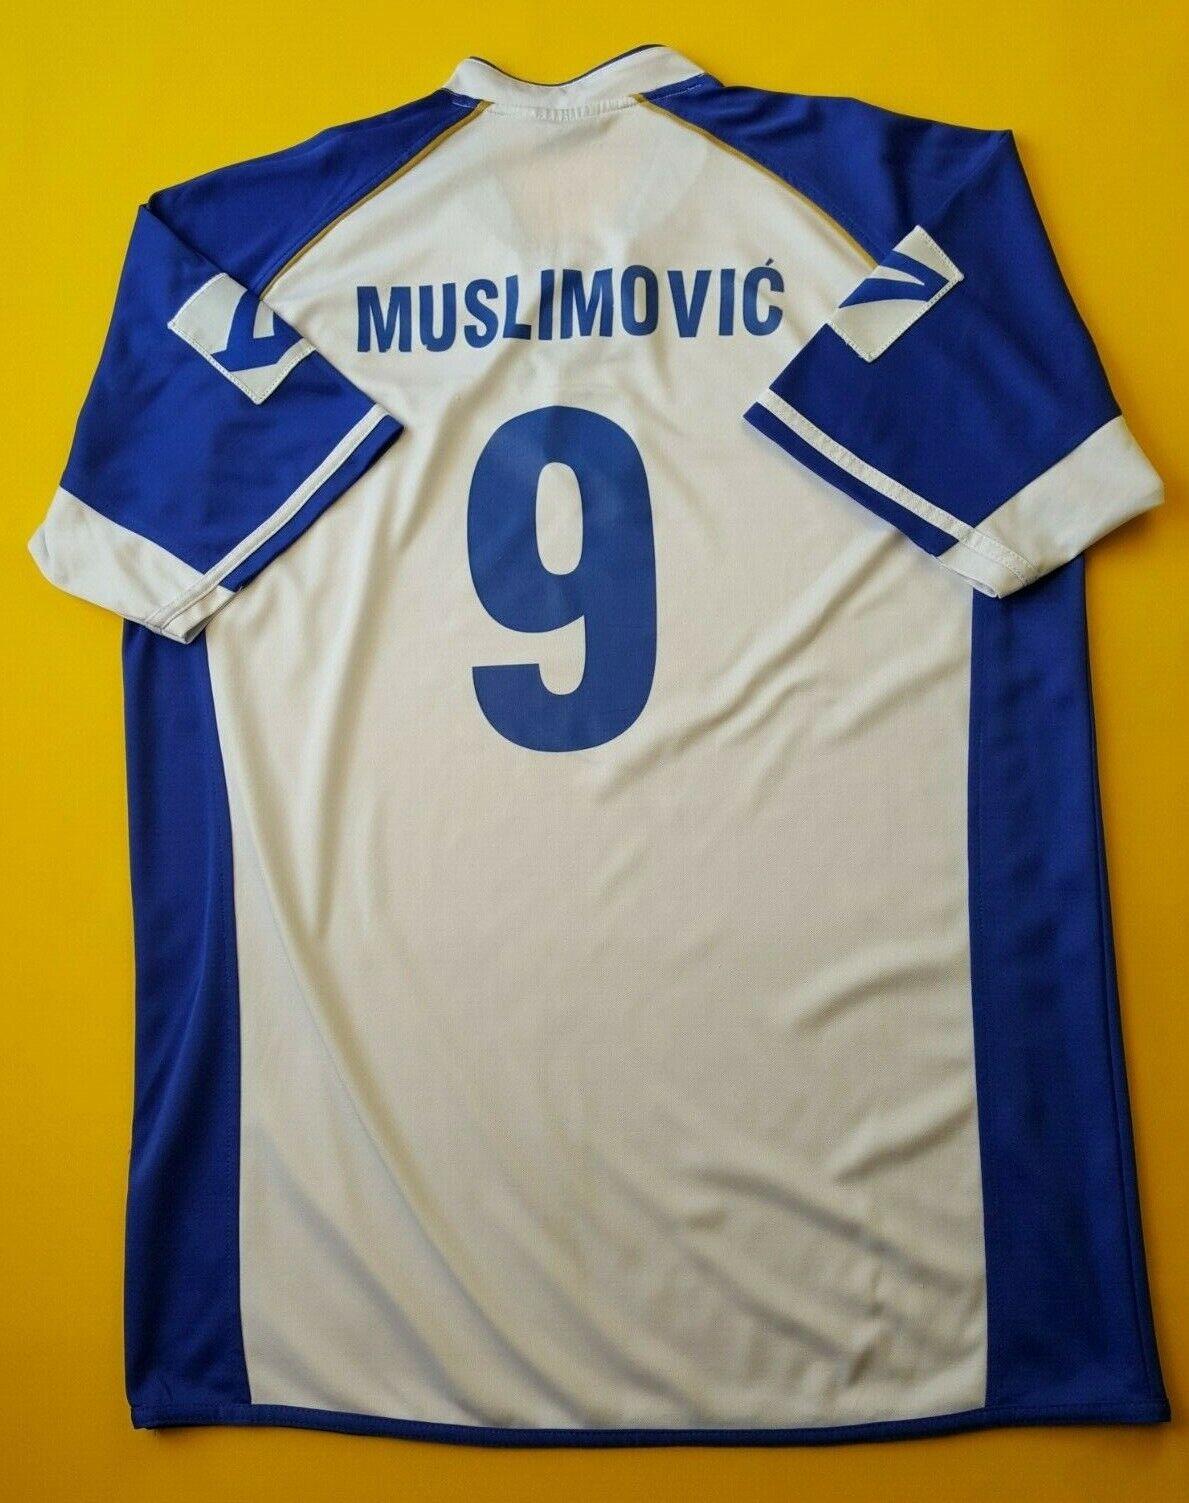 4.3 5 Muslimovic Bosnia Y Herzegovina Jersey Camisa Legea grande de 2006 ig93